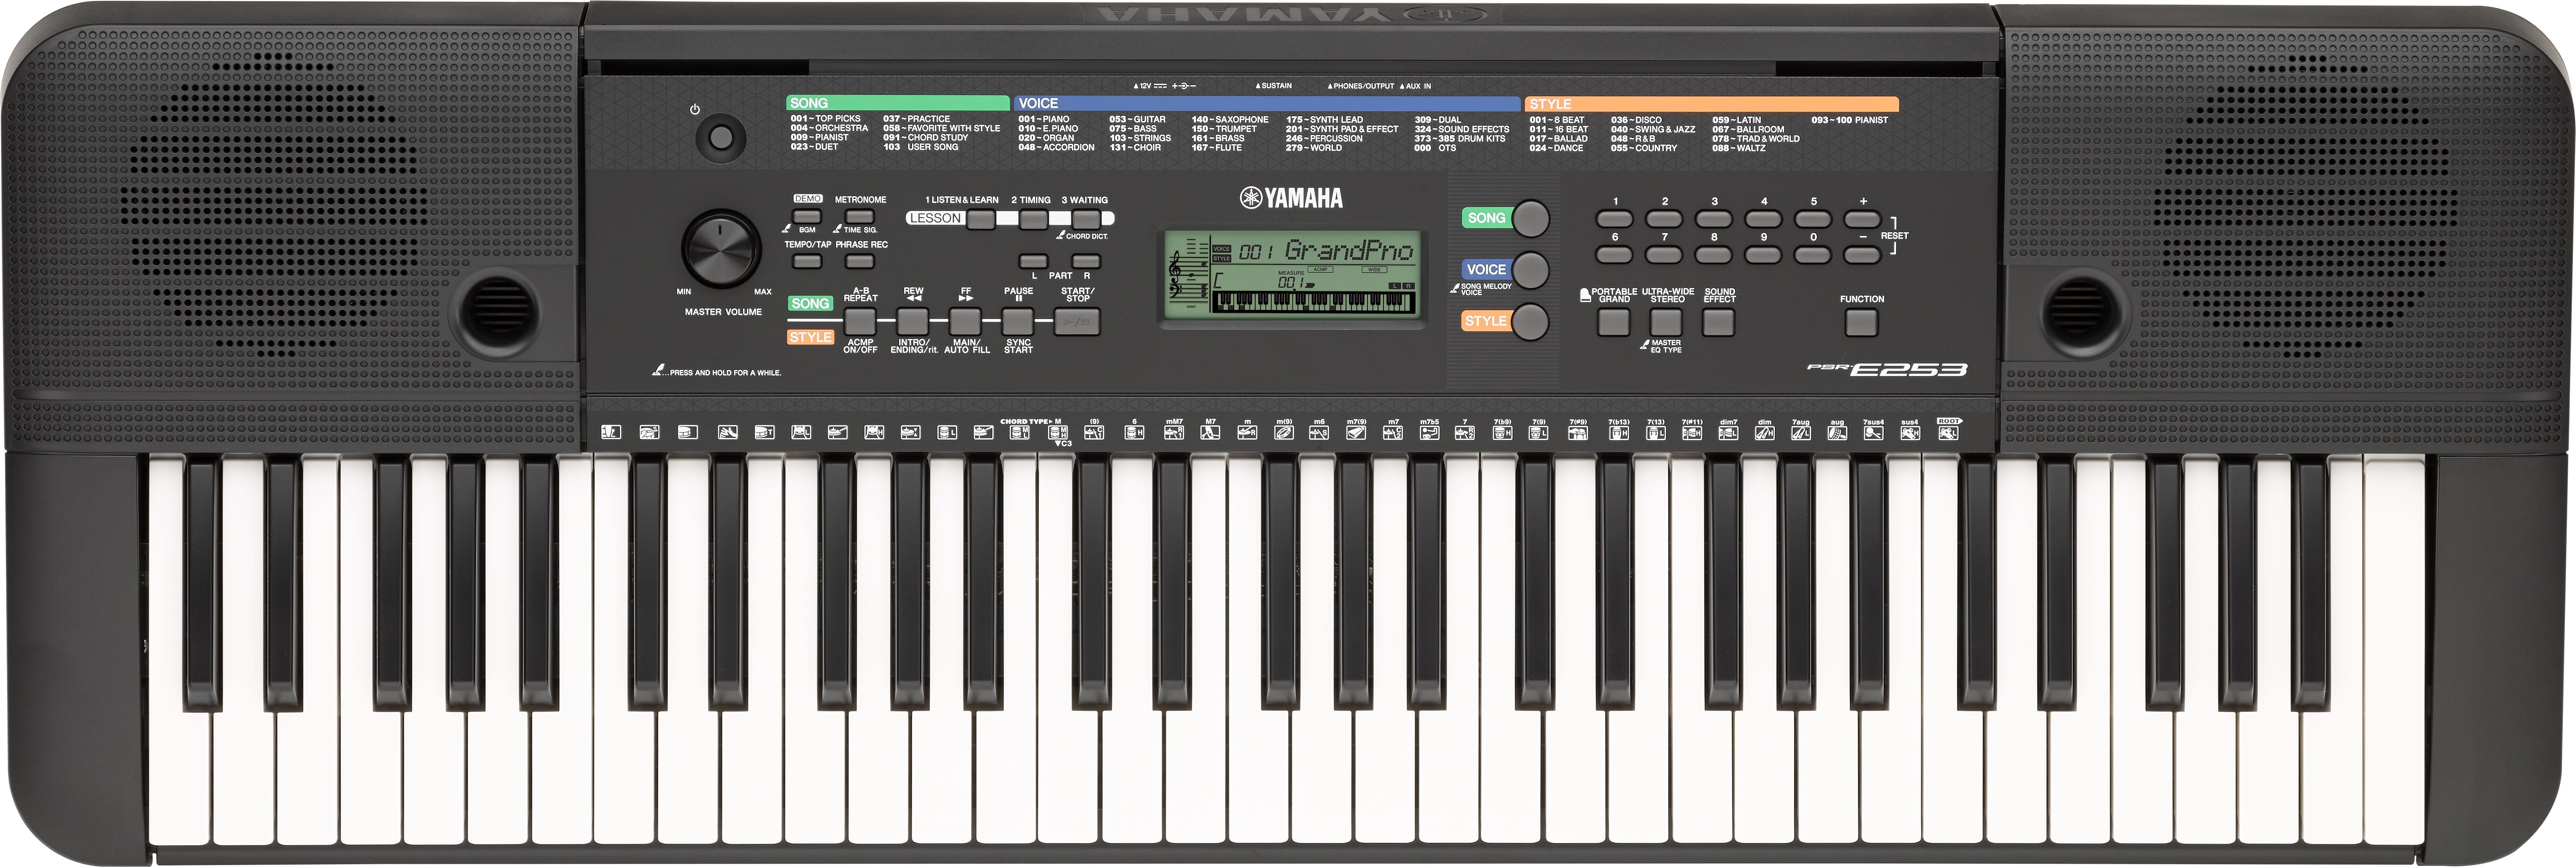 instruments clavier piano num rique yamaha psr 253. Black Bedroom Furniture Sets. Home Design Ideas